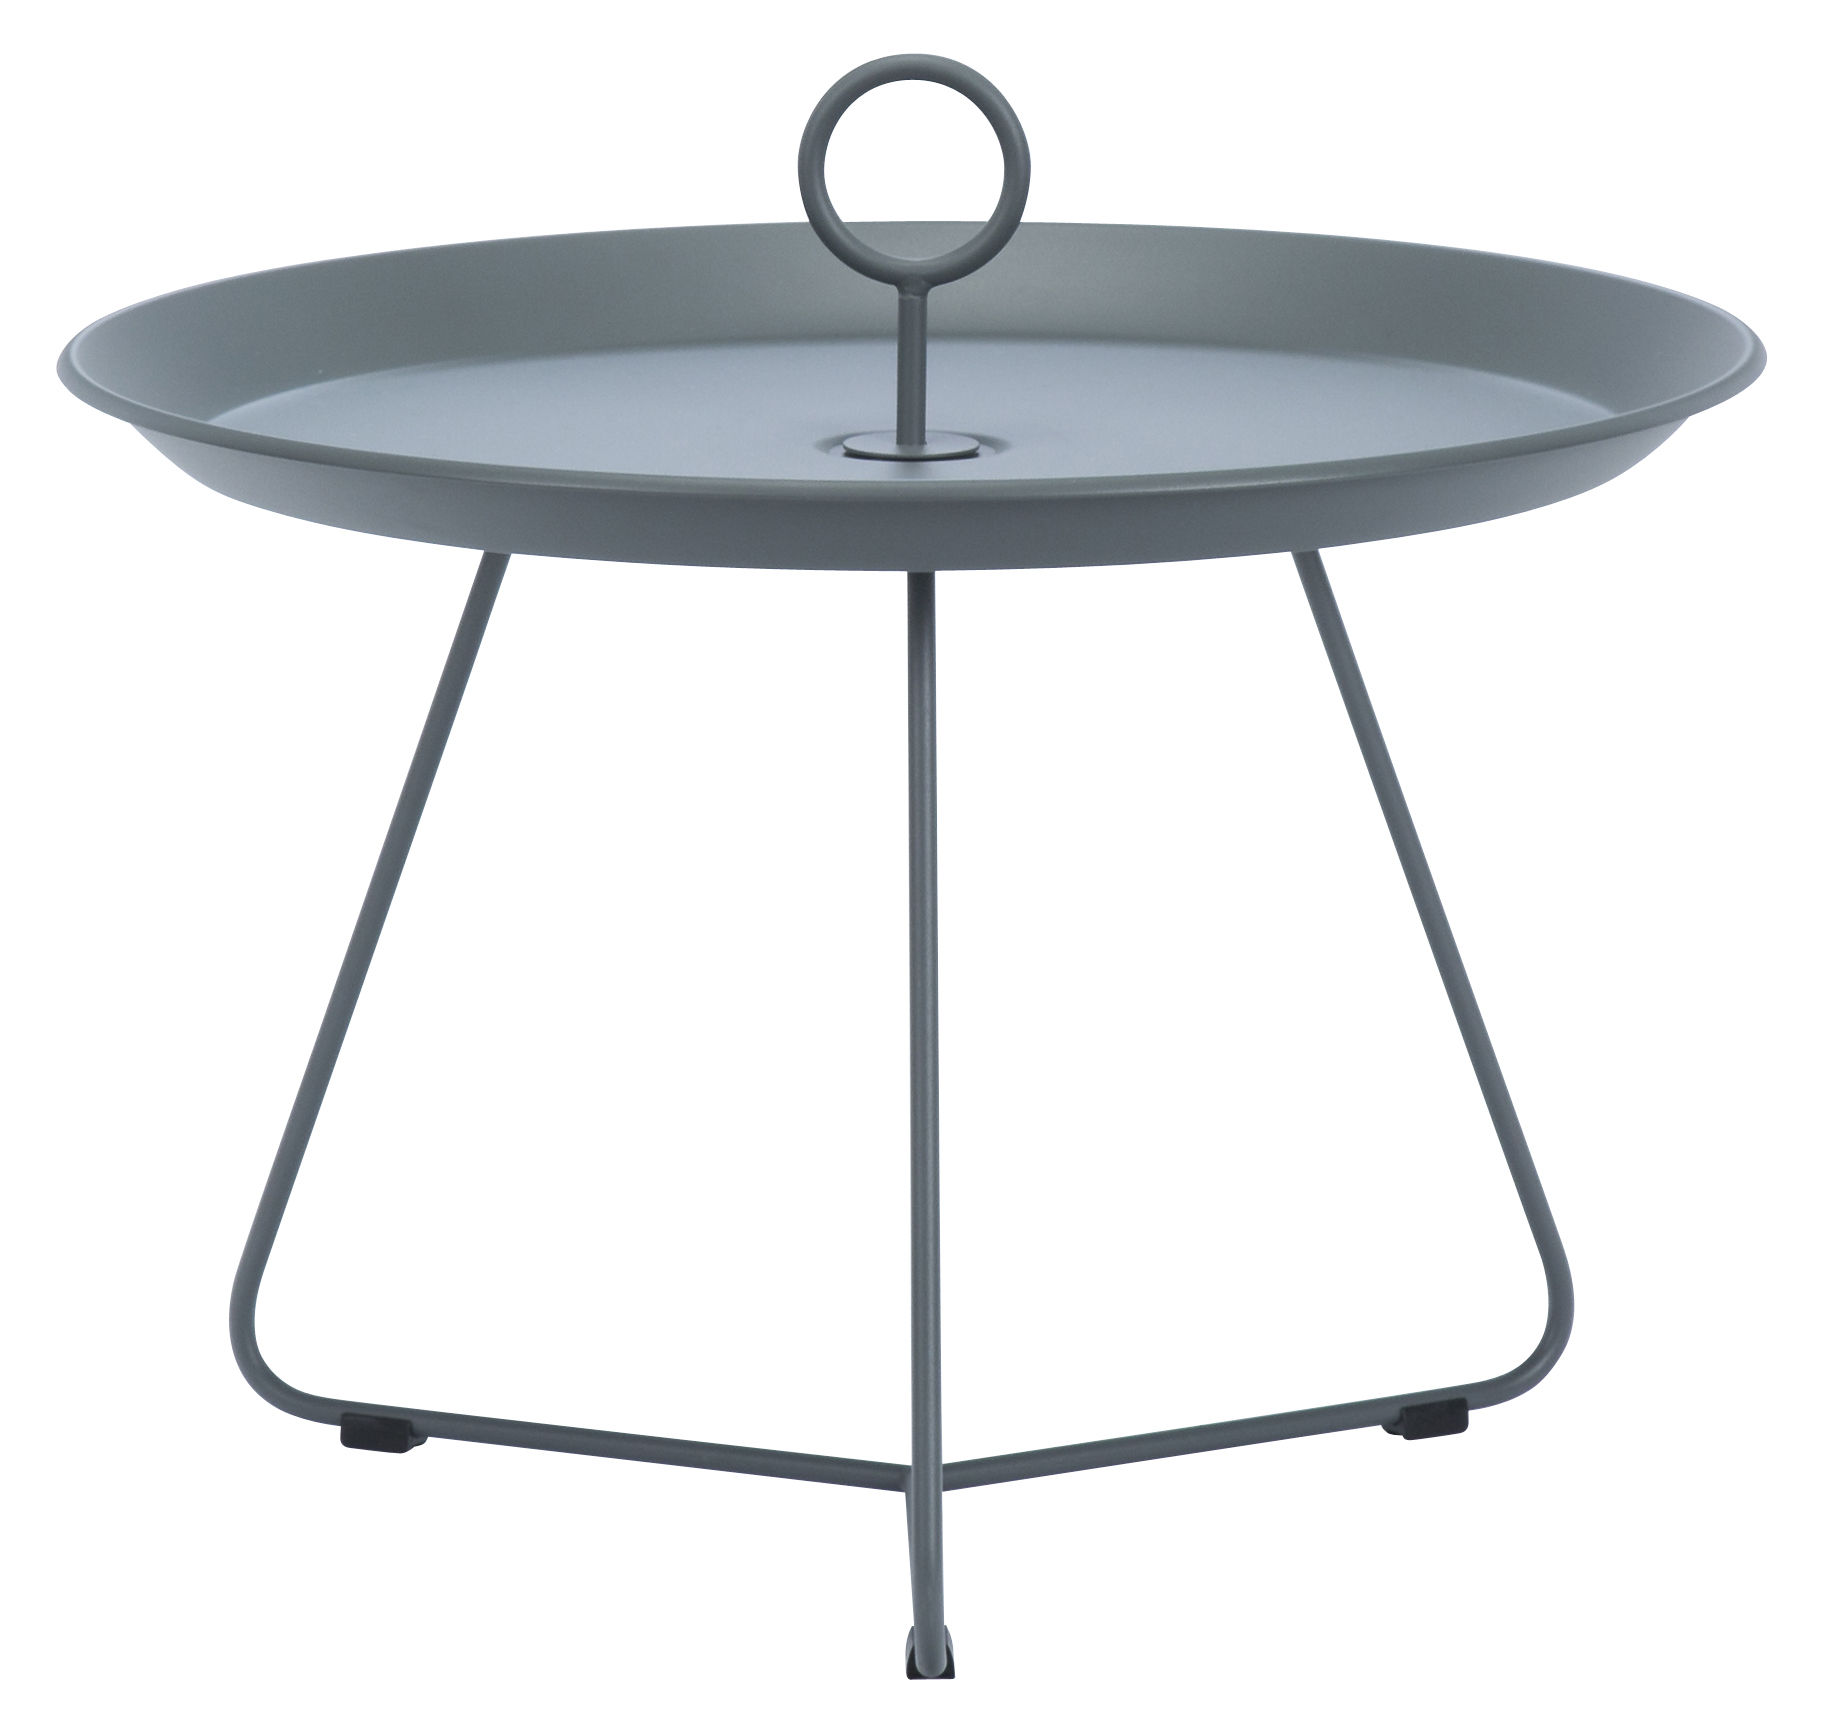 Arredamento - Tavolini  - Tavolino basso Eyelet Medium / Ø 60 x H 43,5 cm - Houe - Grigio scuro - Metallo rivestito in resina epossidica